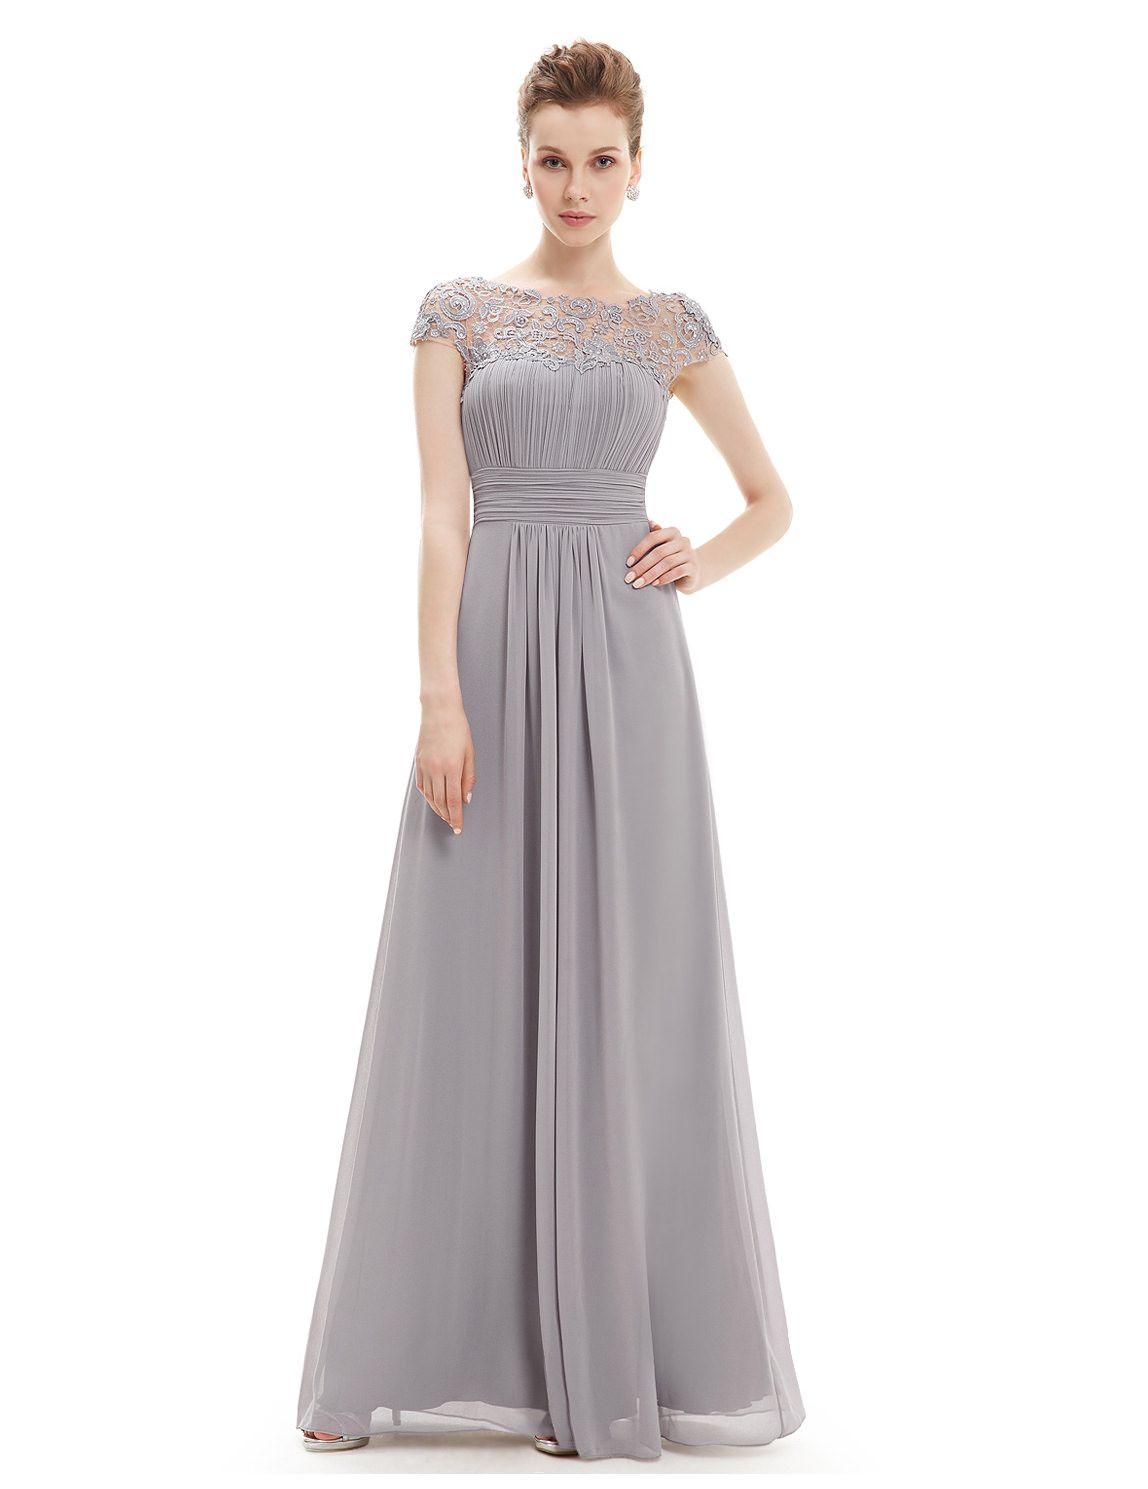 Elegantes langes Chiffon Abendkleid in Grau  Abendkleid